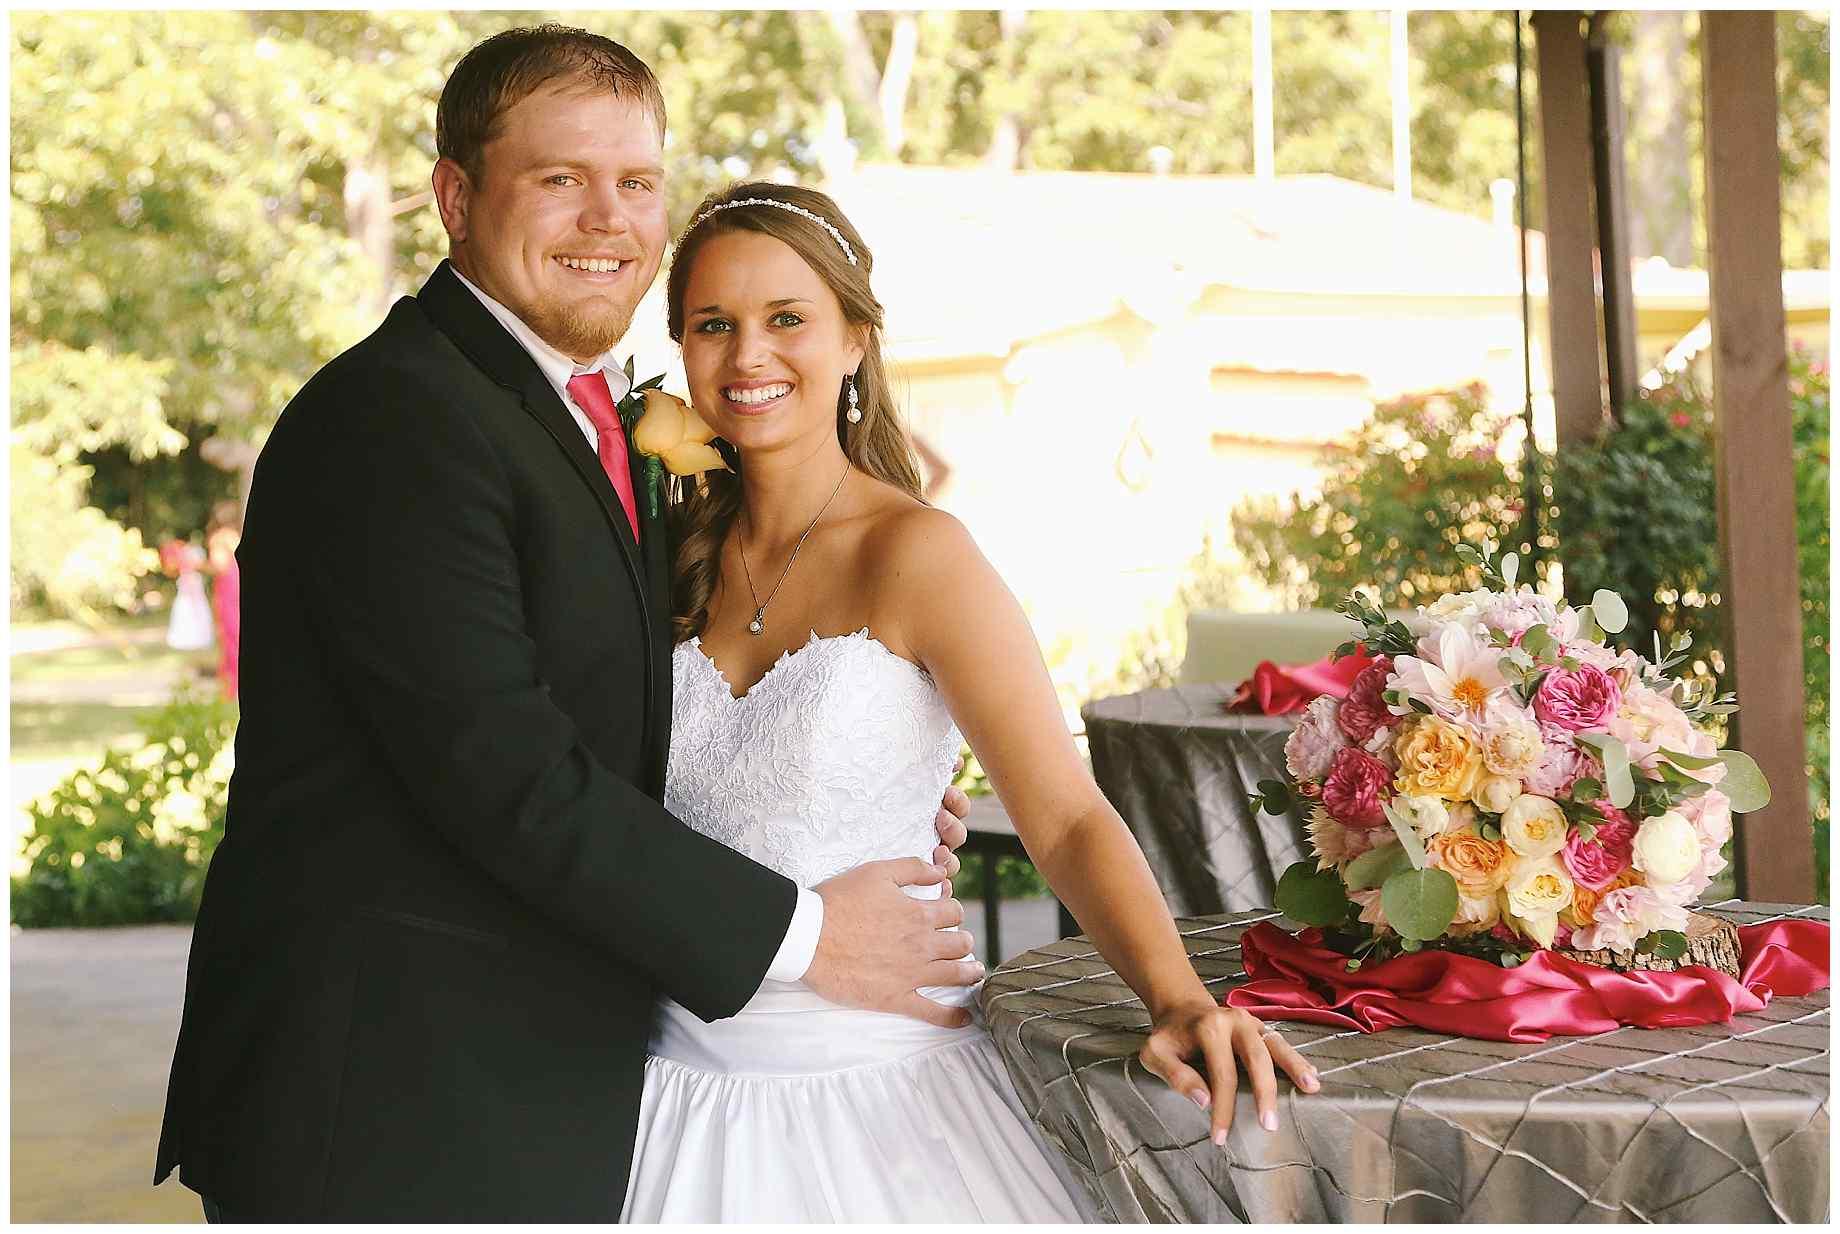 pecan-springs-ranch-austin-tx-wedding-008